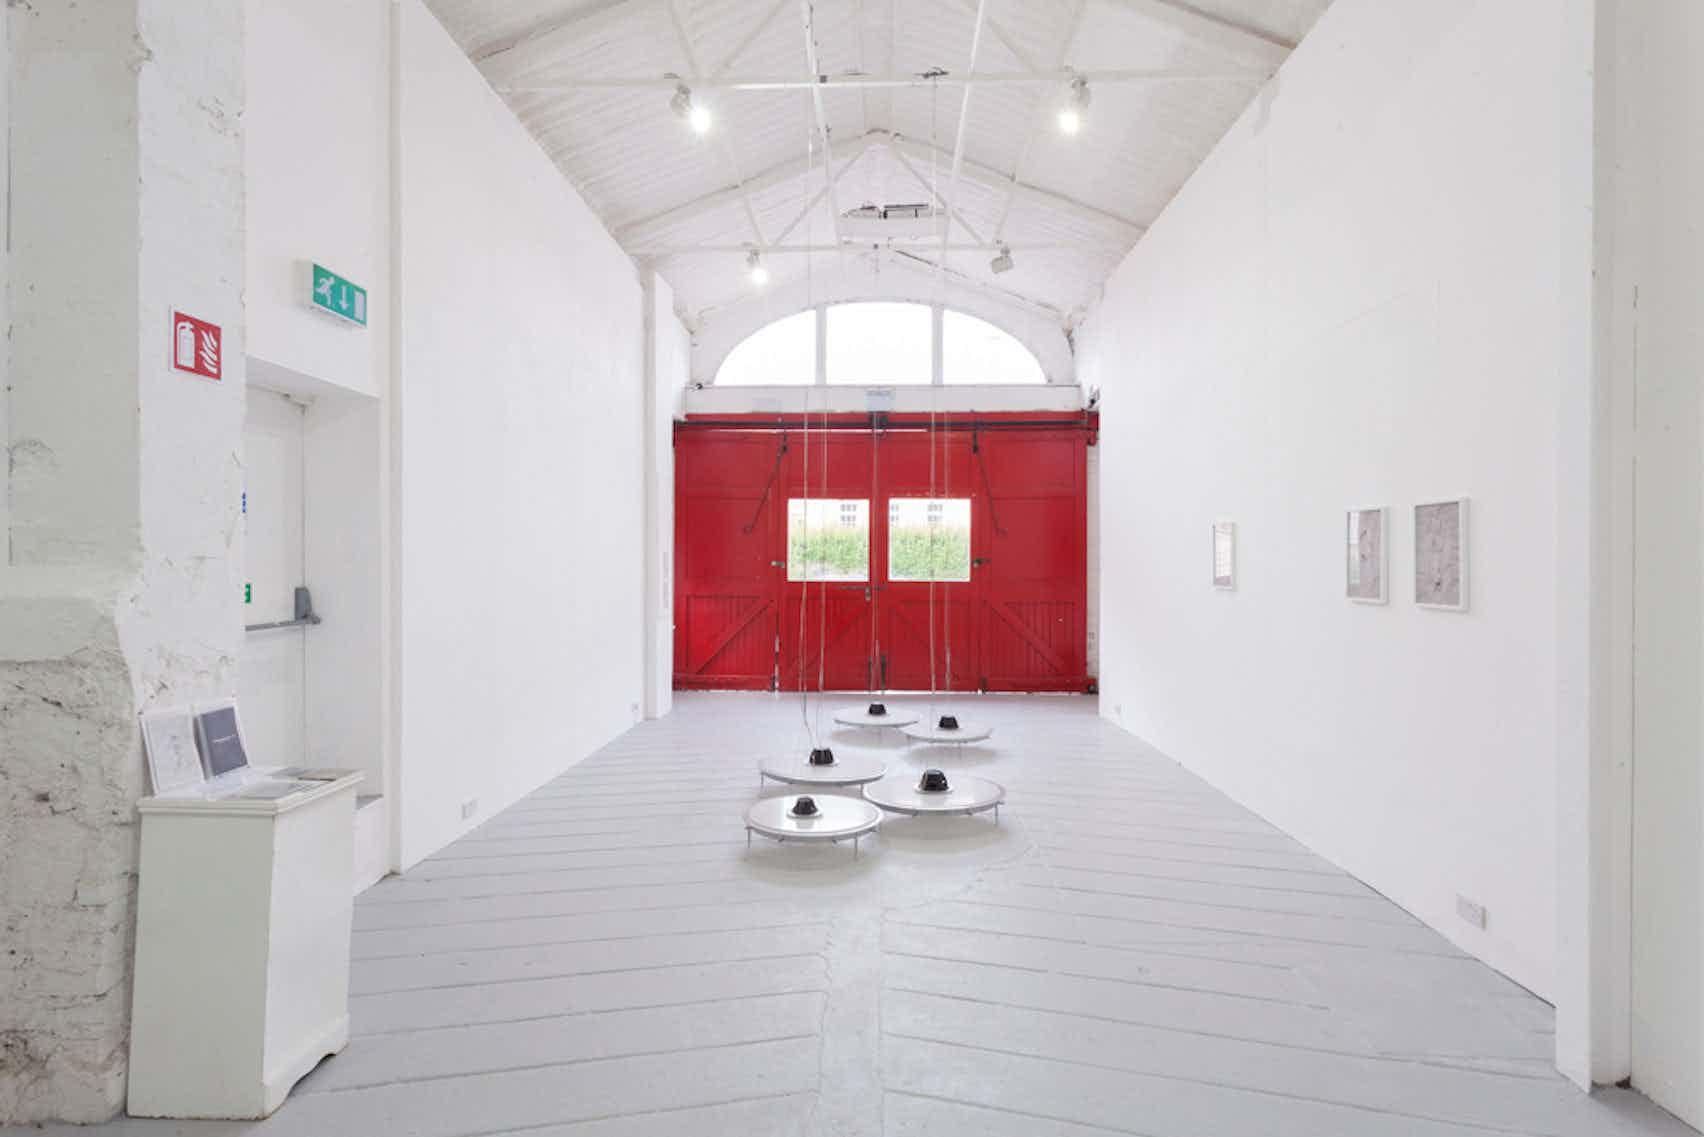 Gallery 1 & 2, MART Gallery